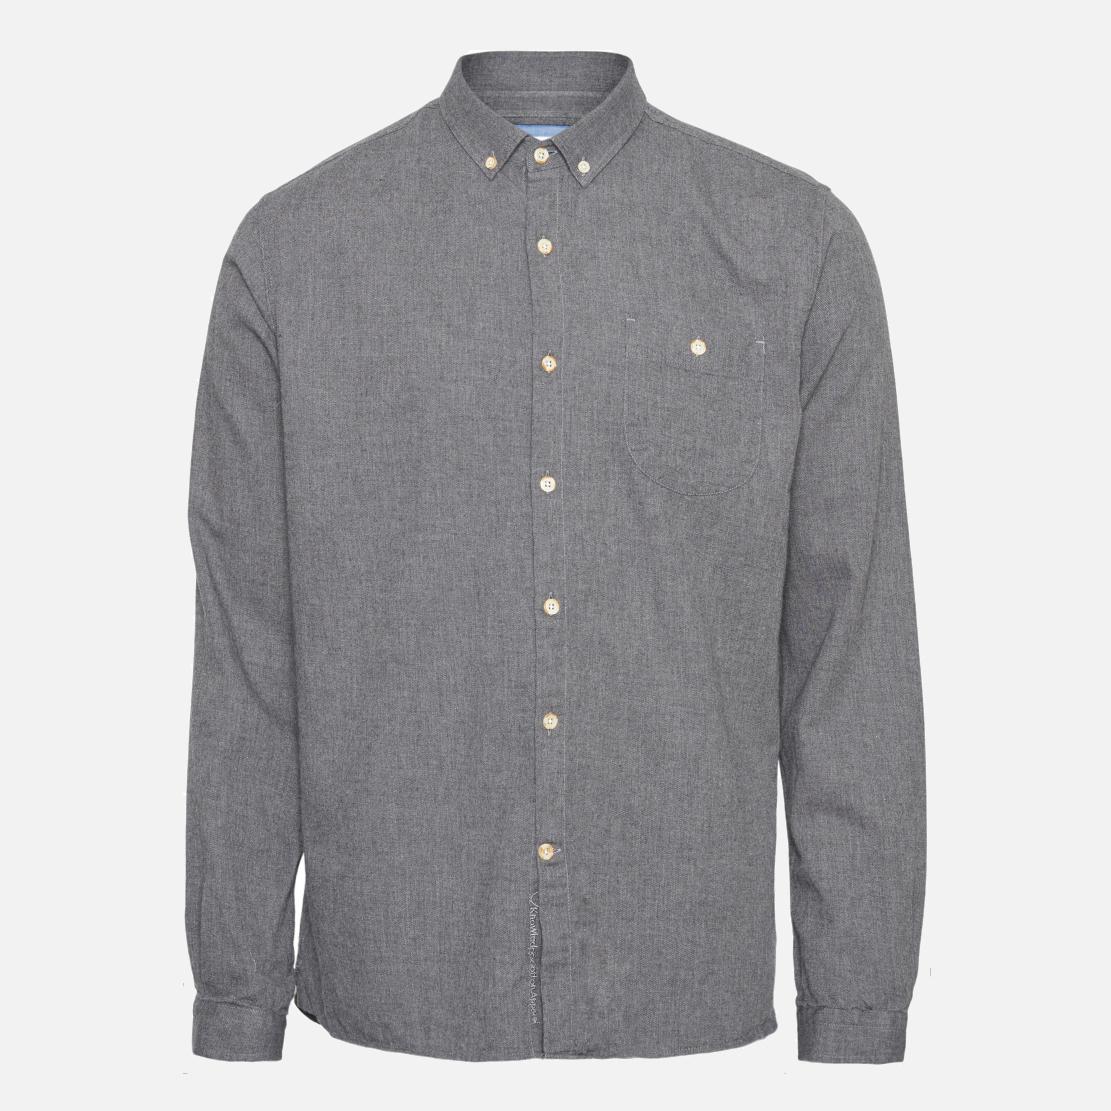 Lått borstad flanellskjorta i 100% ekologisk bomull. Mörkgrå melerad